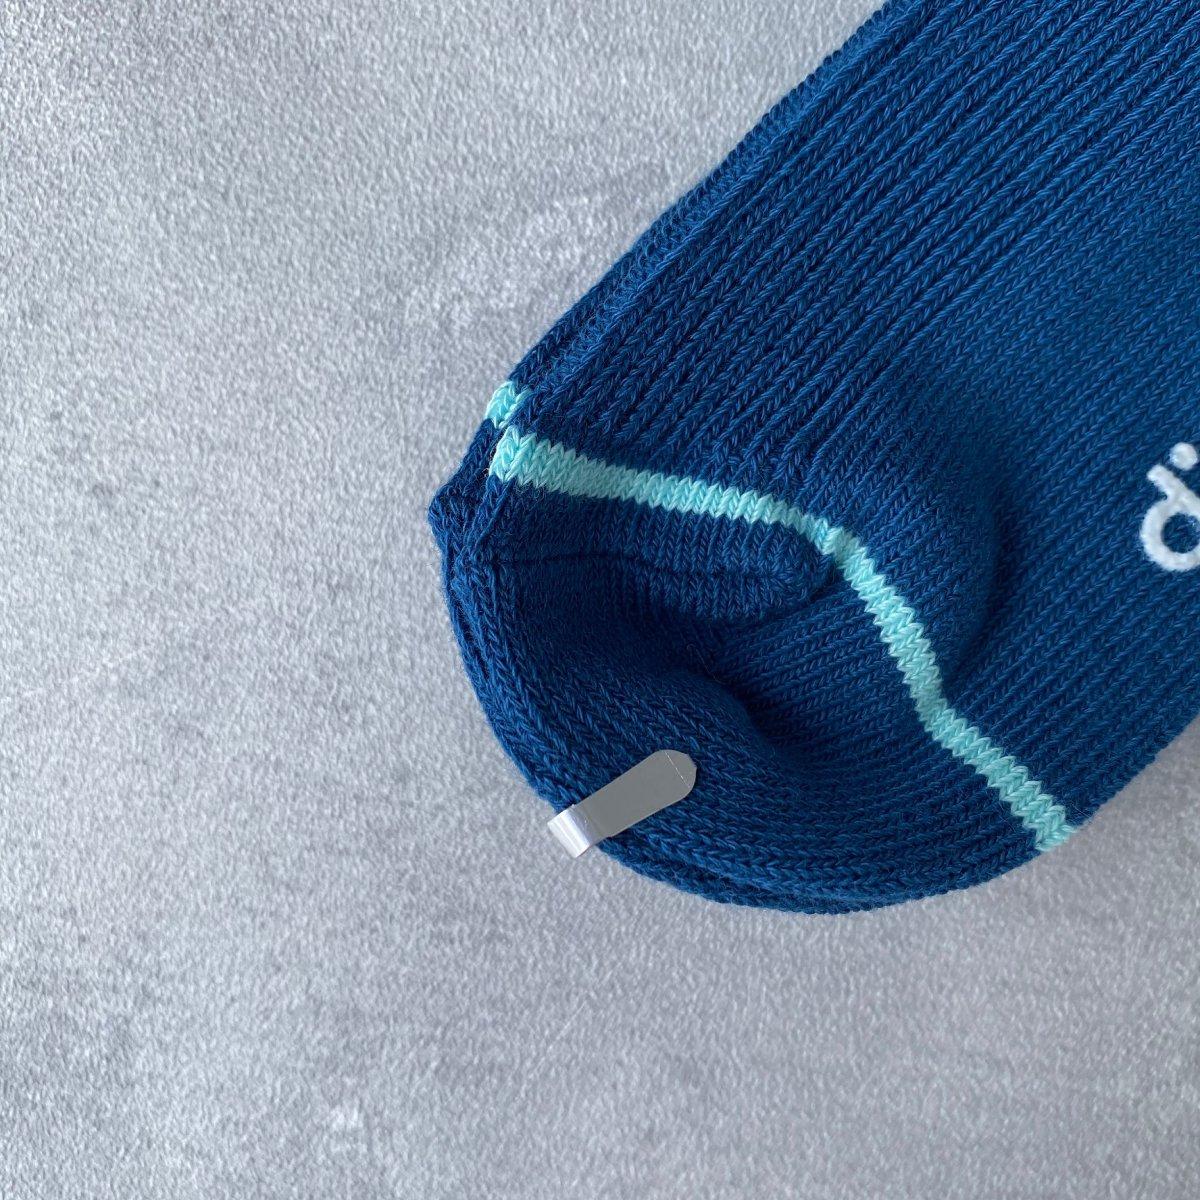 【BABY】Dino Socks 詳細画像11